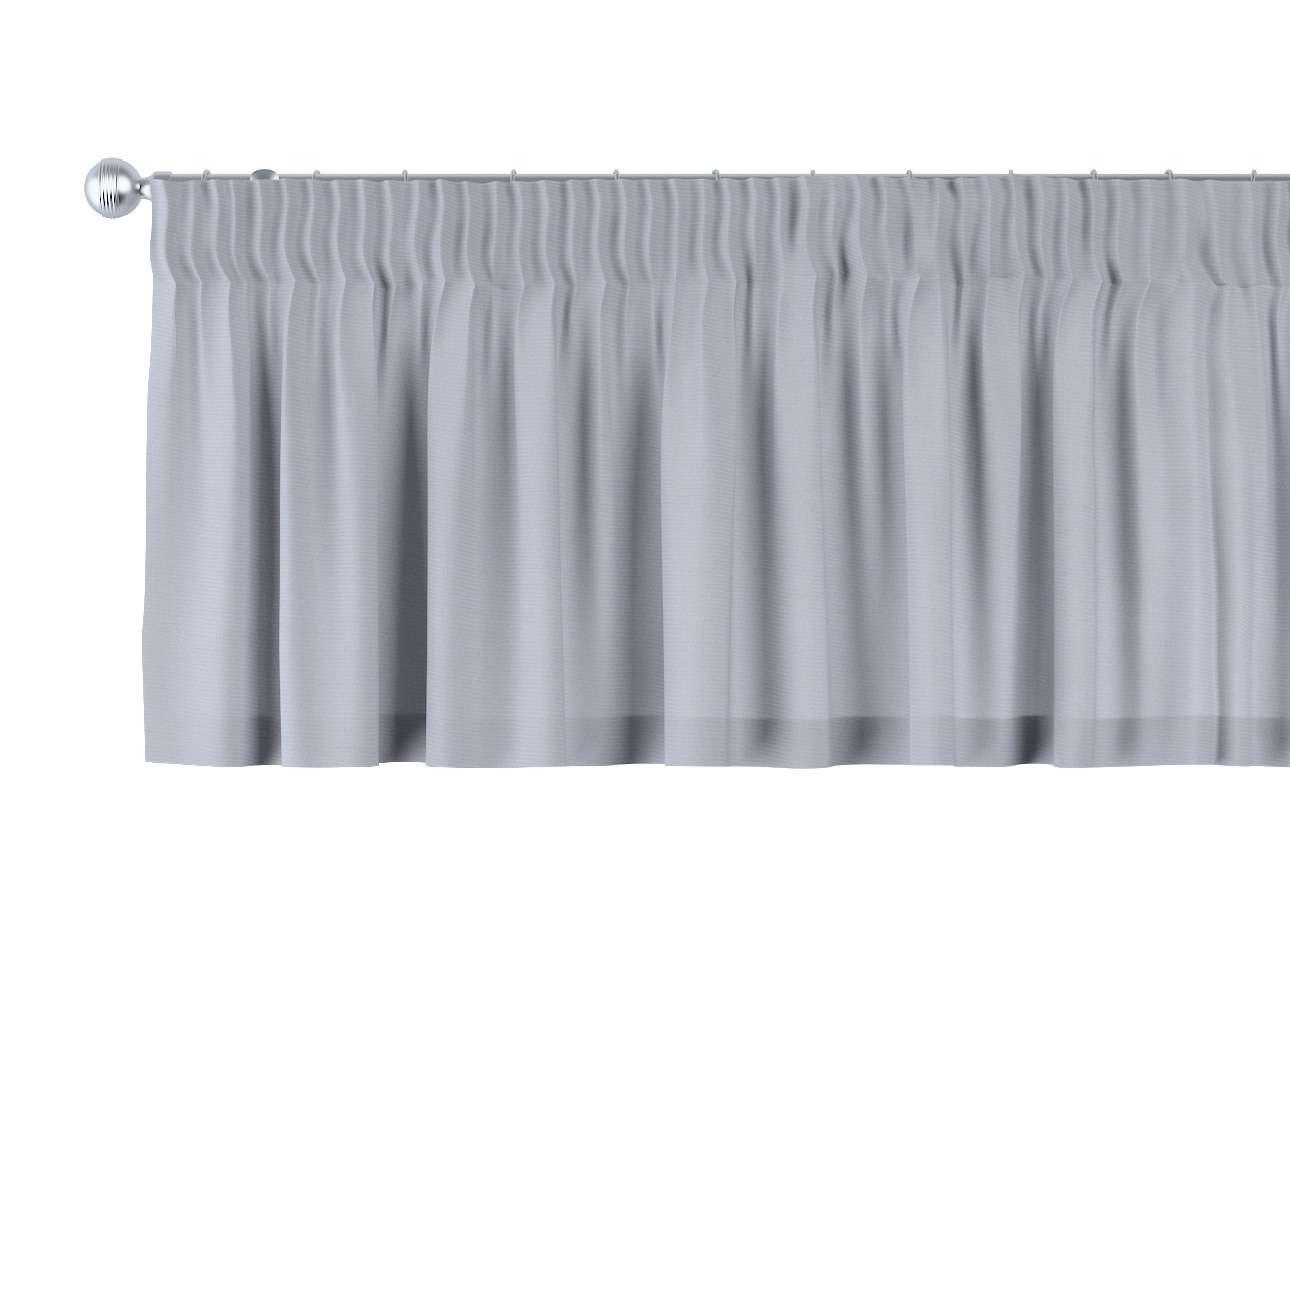 Gardinkappa med rynkband 130 × 40 cm i kollektionen Jupiter, Tyg: 127-92